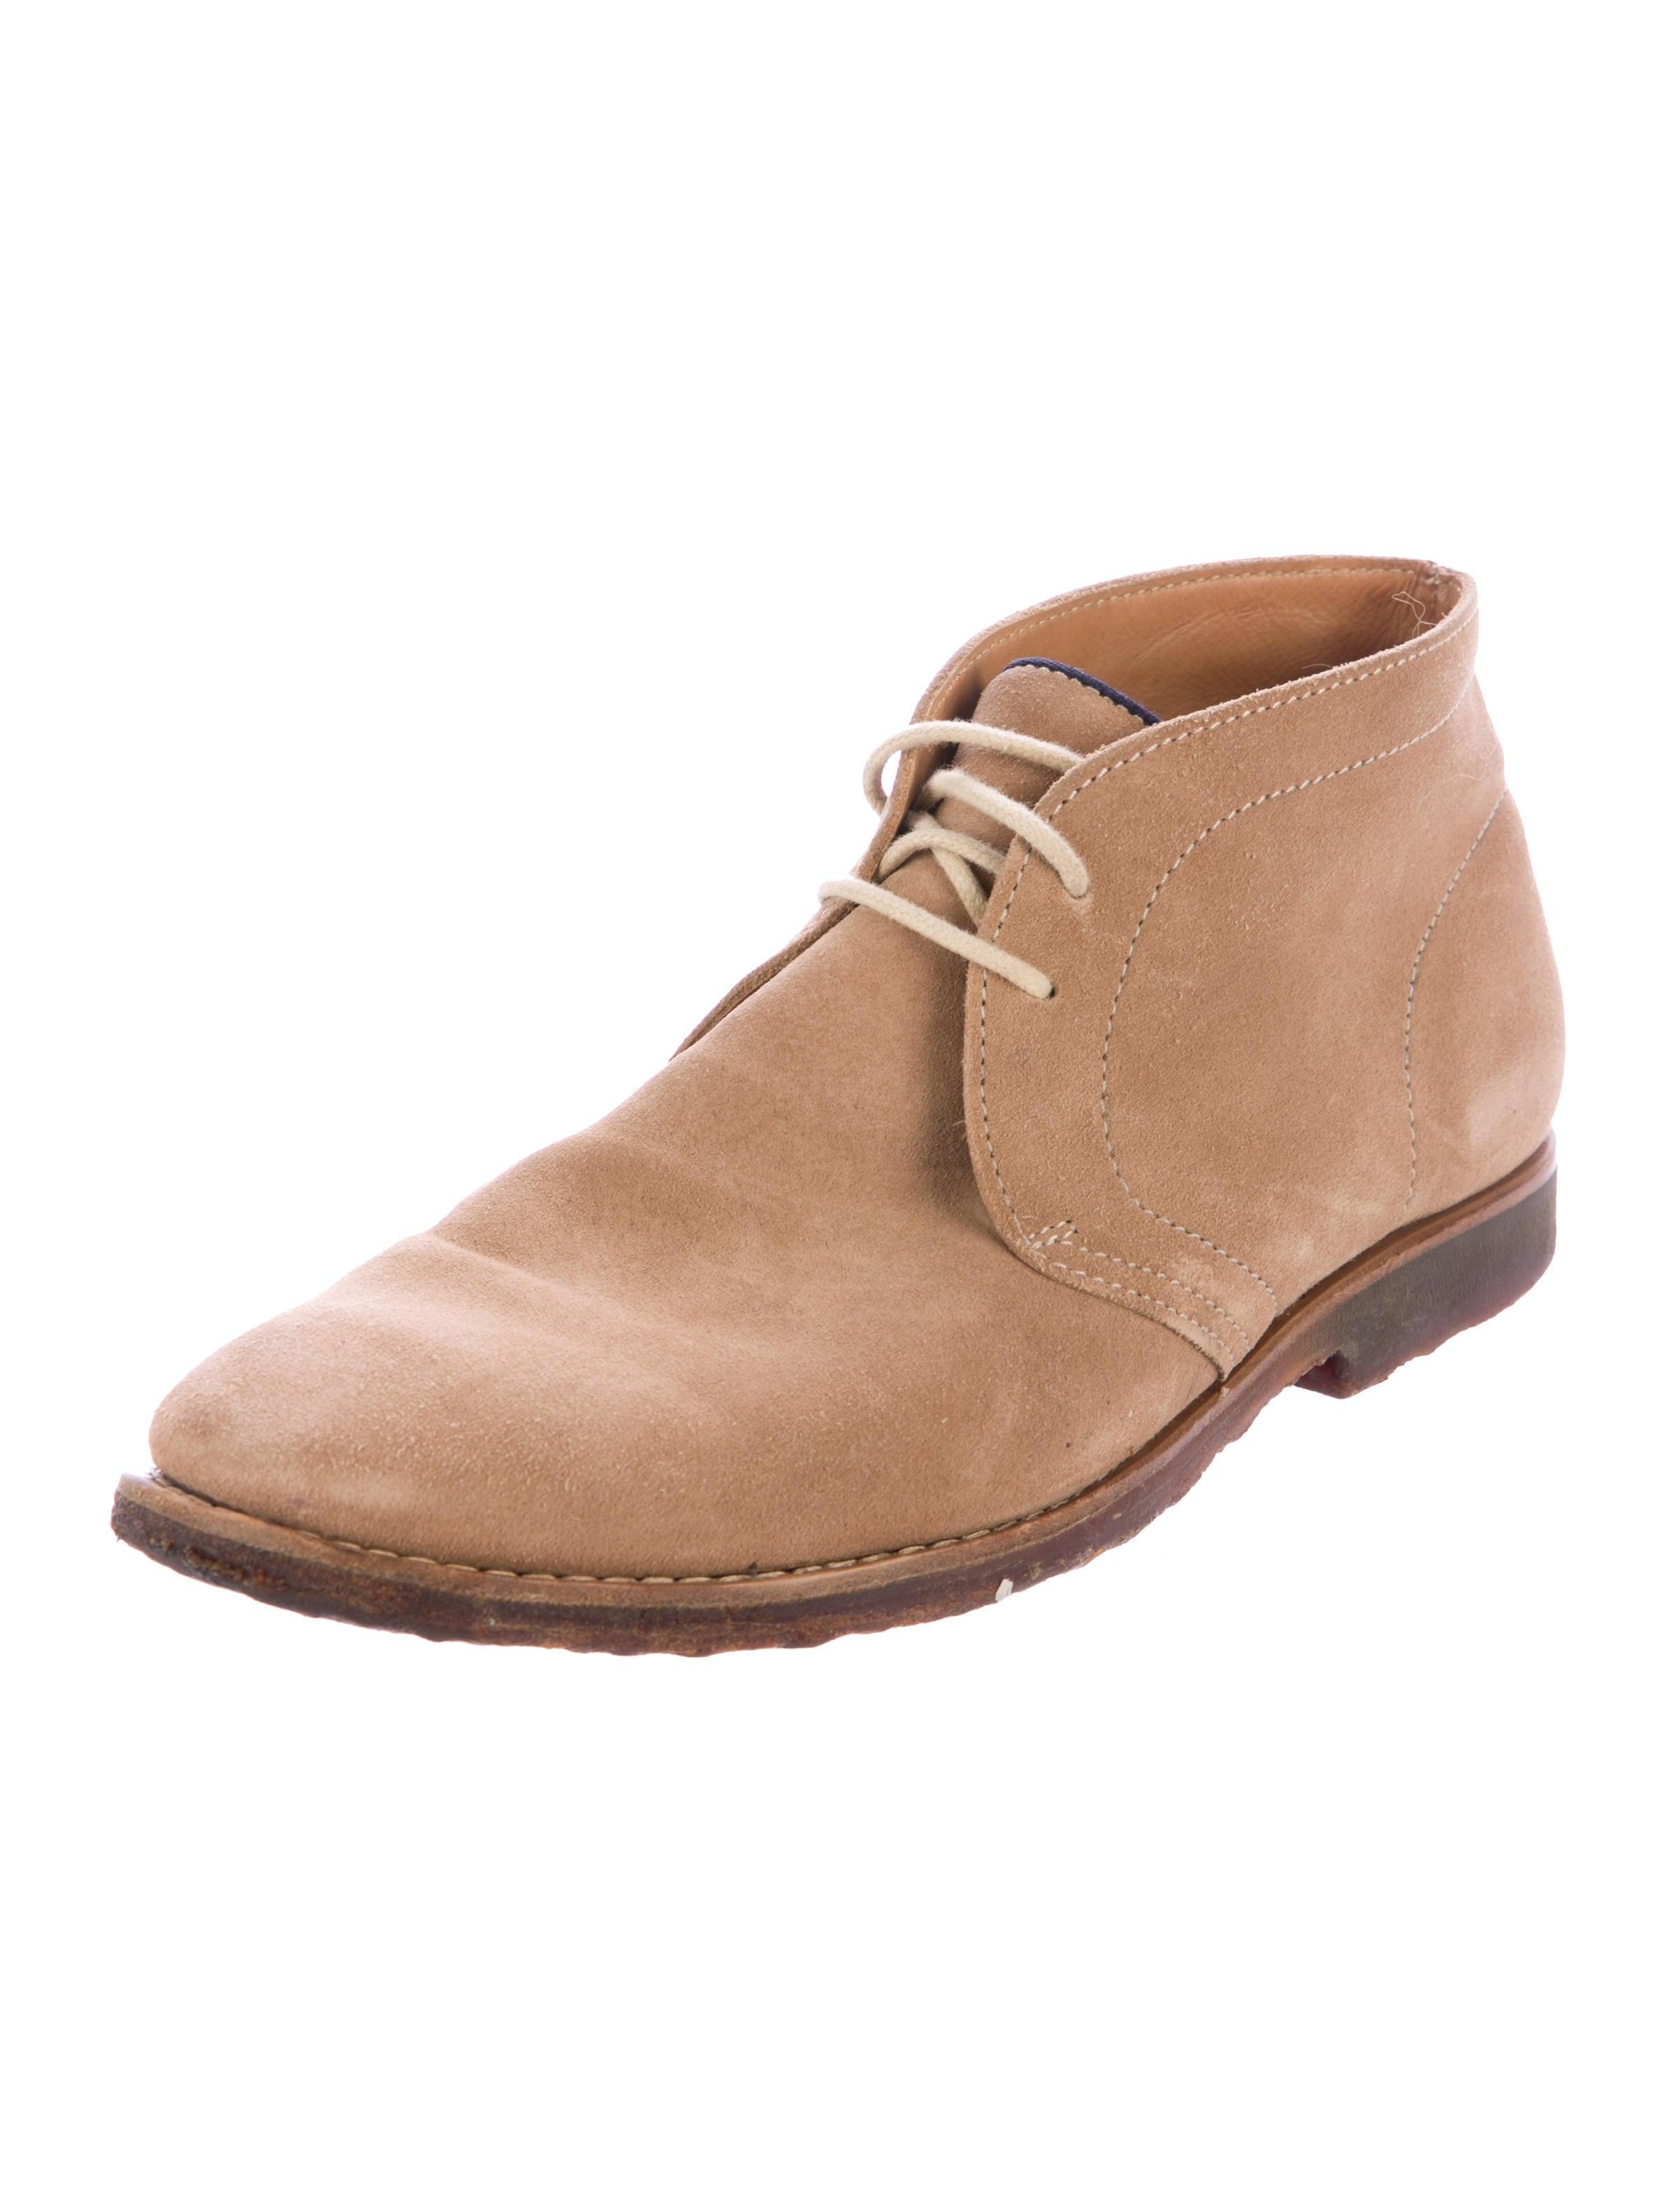 brunello cucinelli suede desert boot shoes bru48613